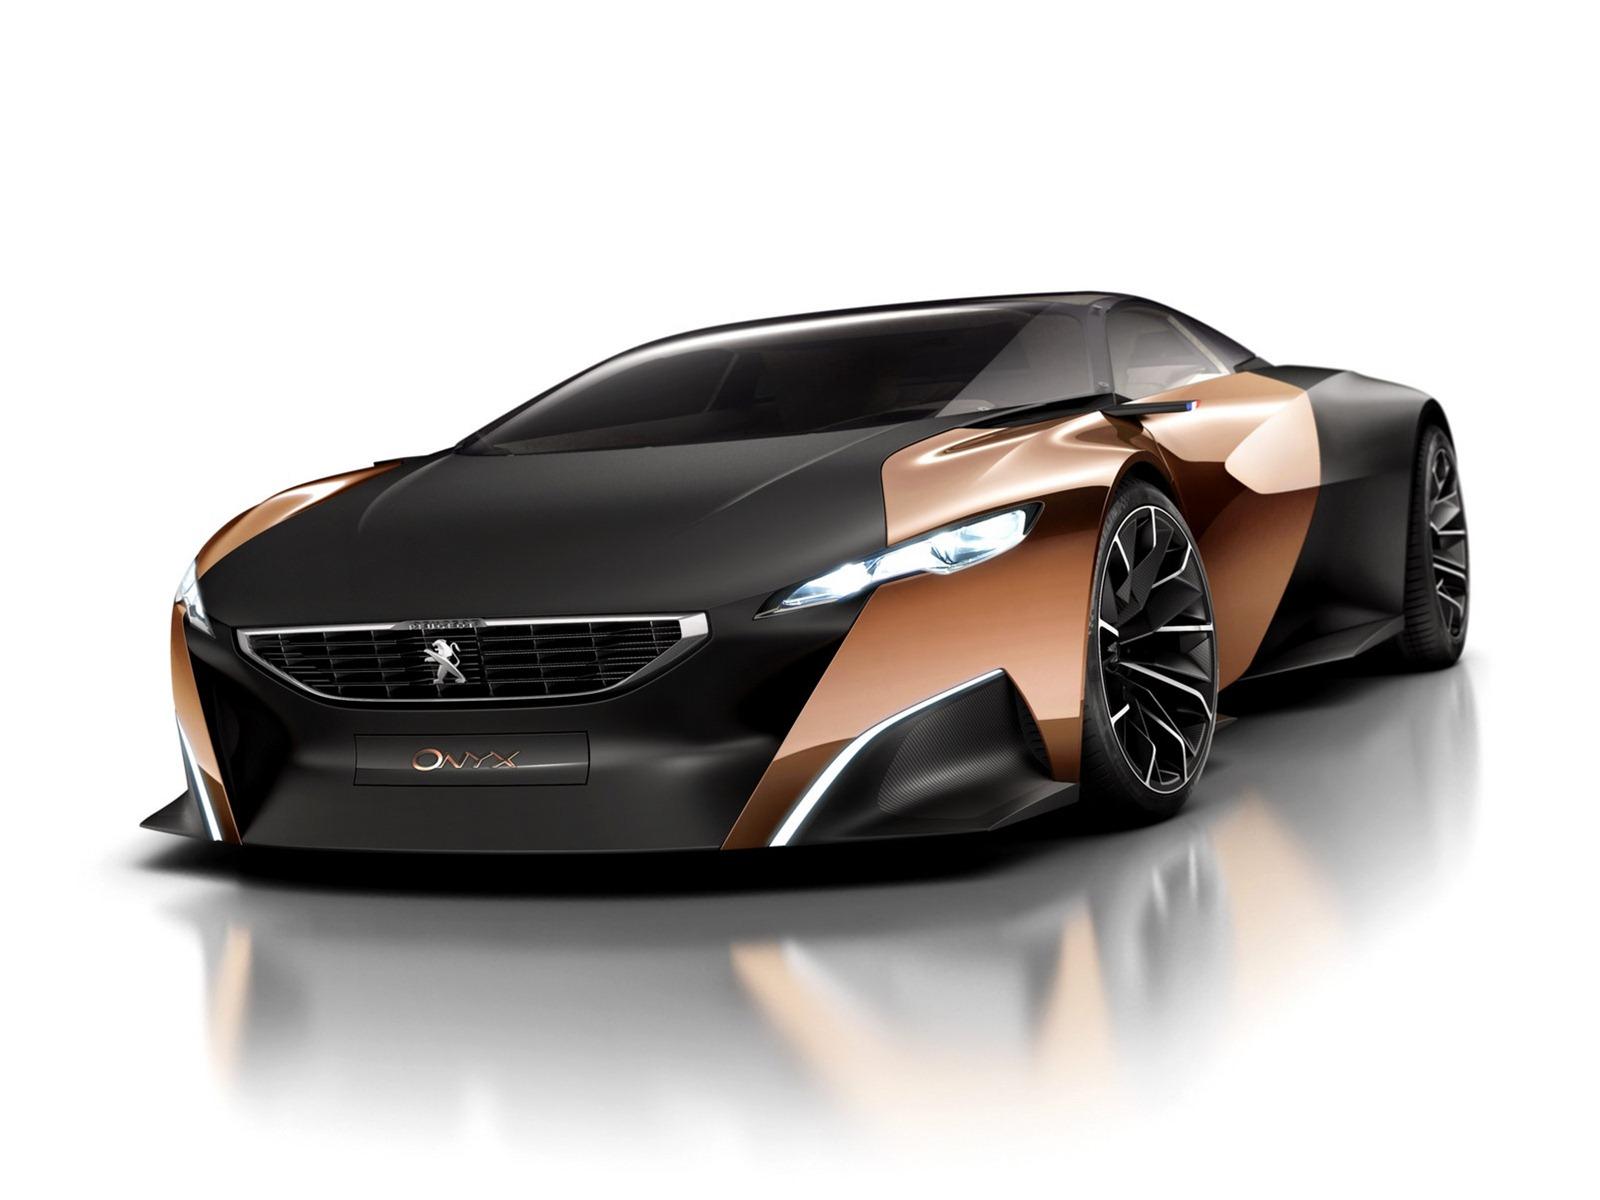 Peugeot Onyx Concept Photos Leaked